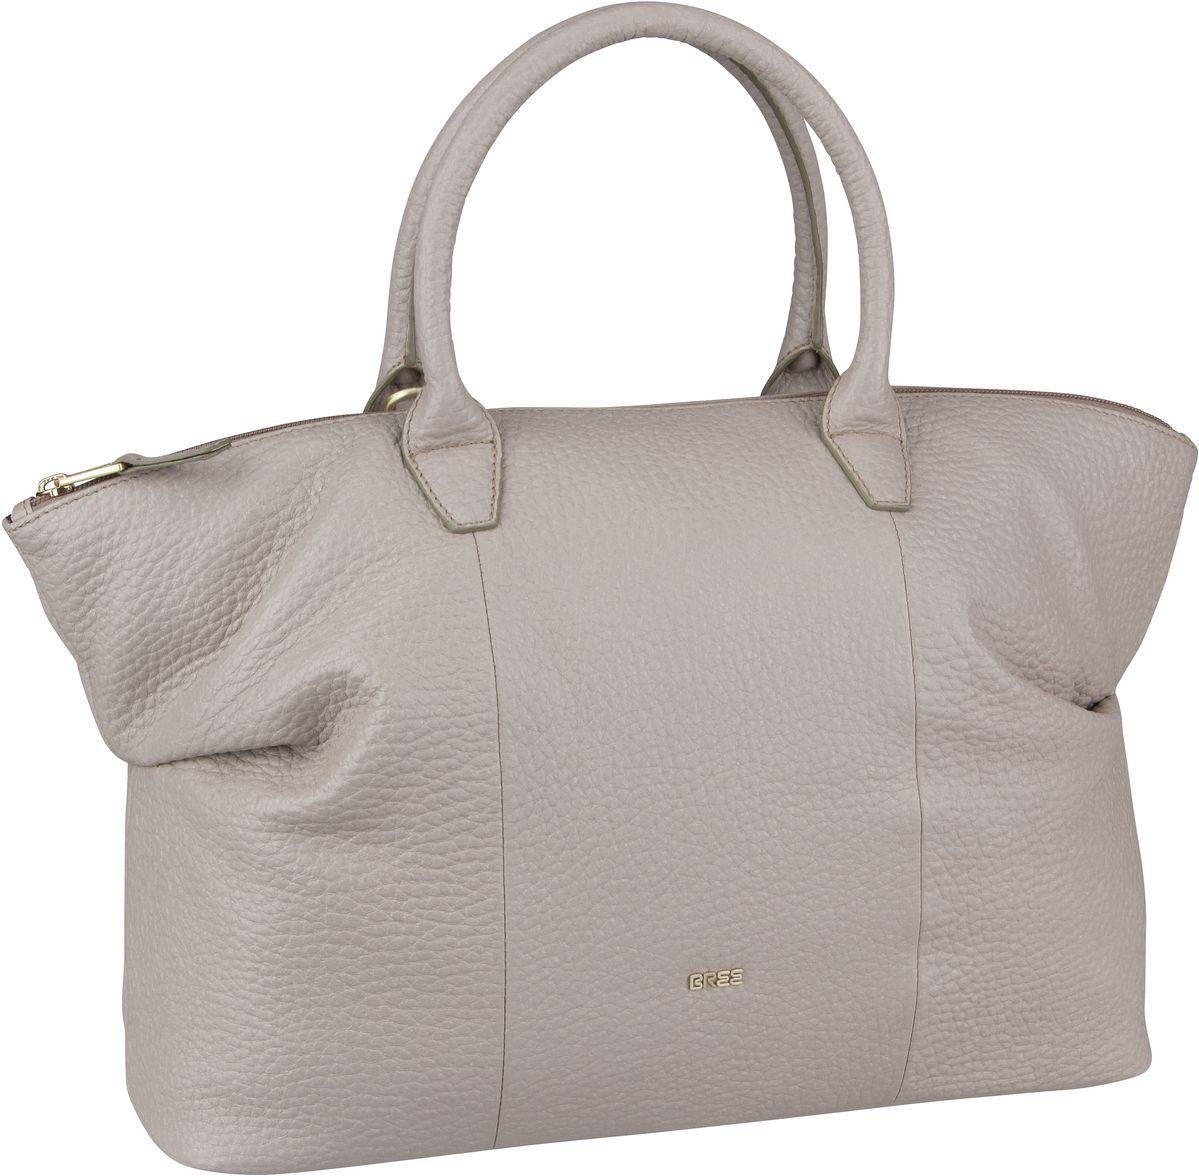 Handtasche Icon Bag Mushroom